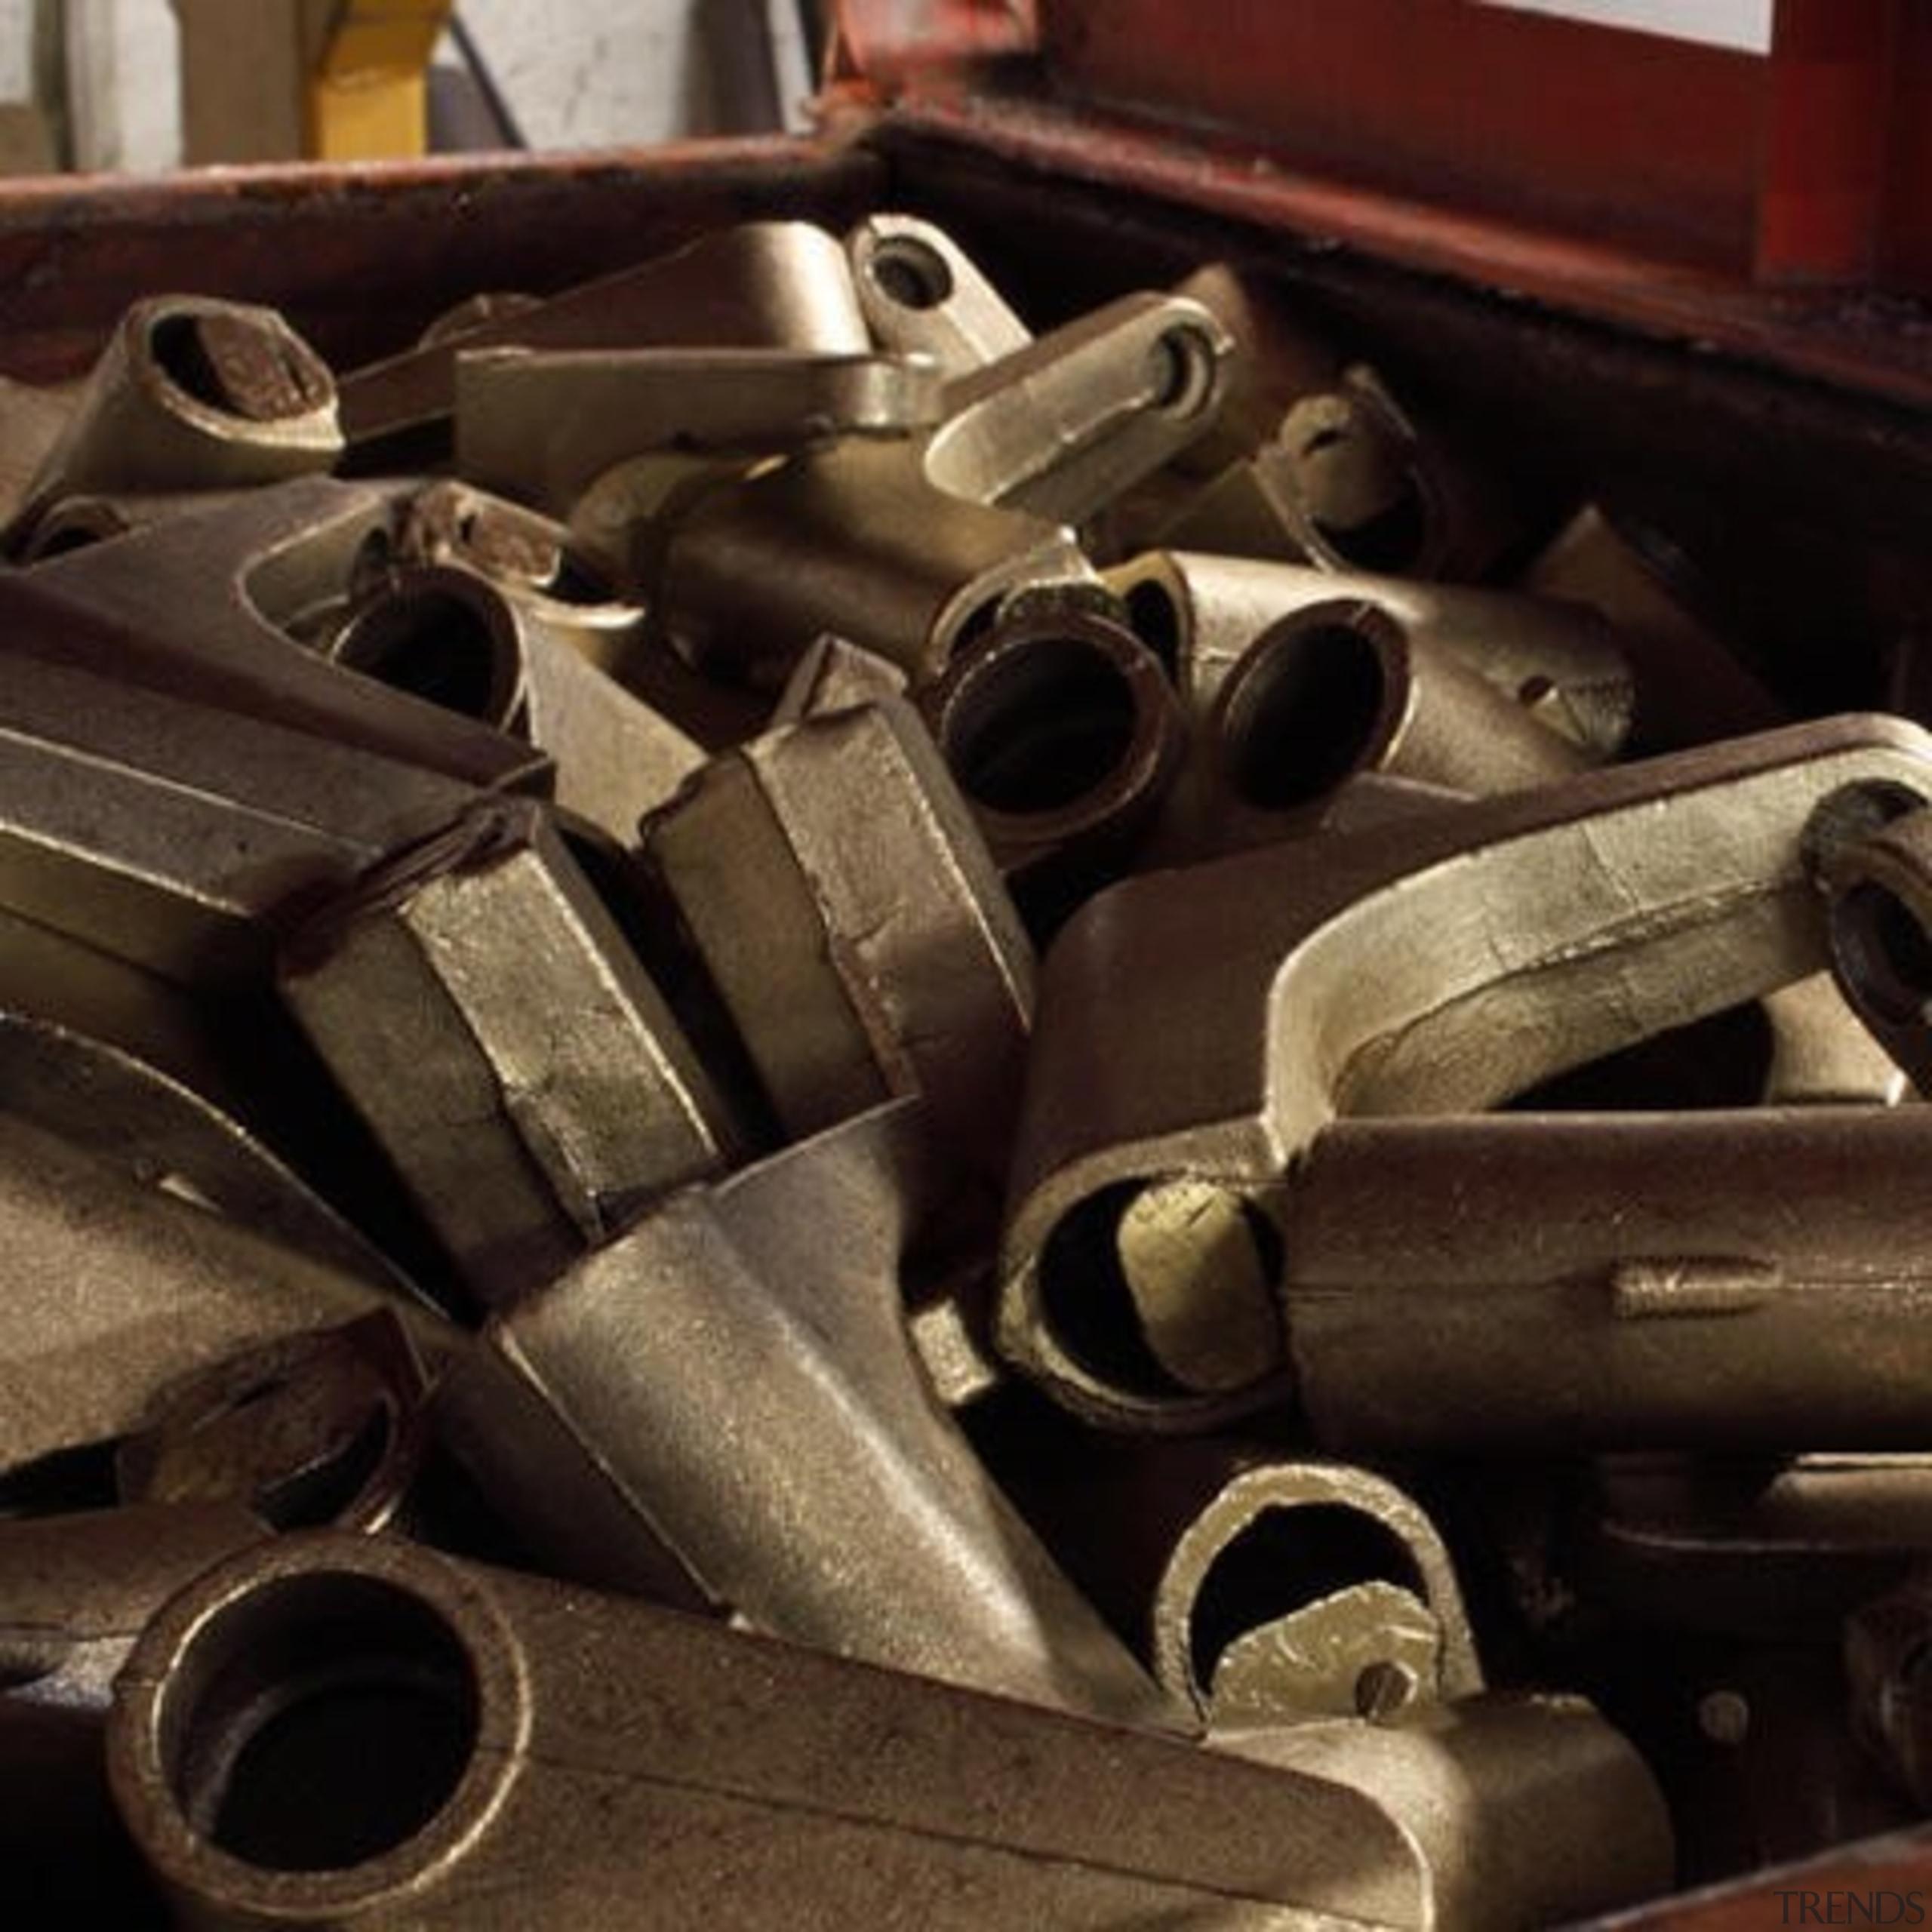 Treemme is the dazzling new range of Italian firearm, gun, material, metal, weapon, black, brown